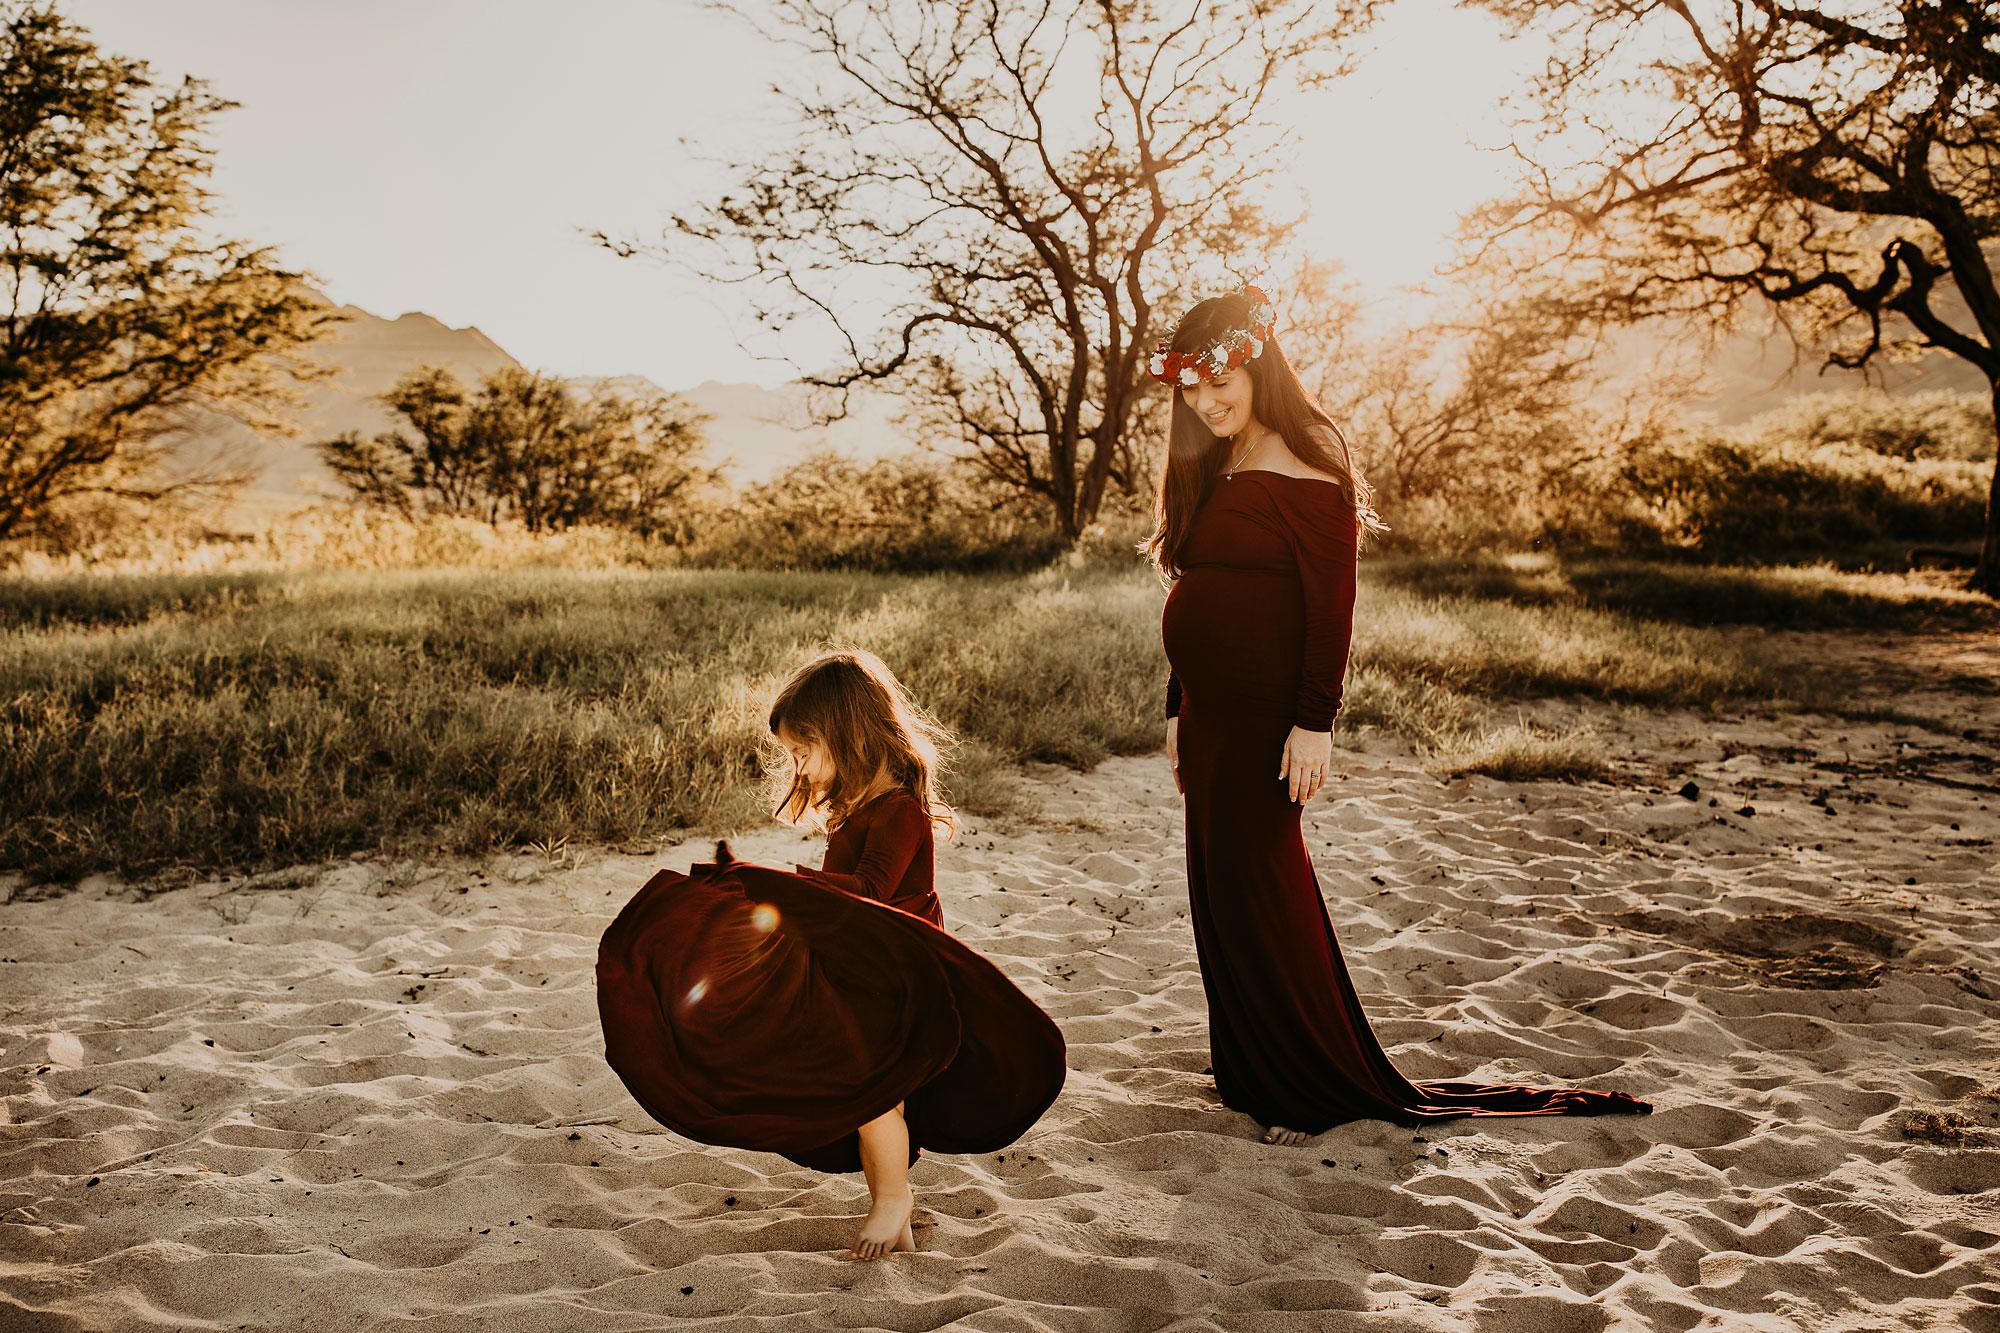 oahu-maternity-photographer-09.jpg